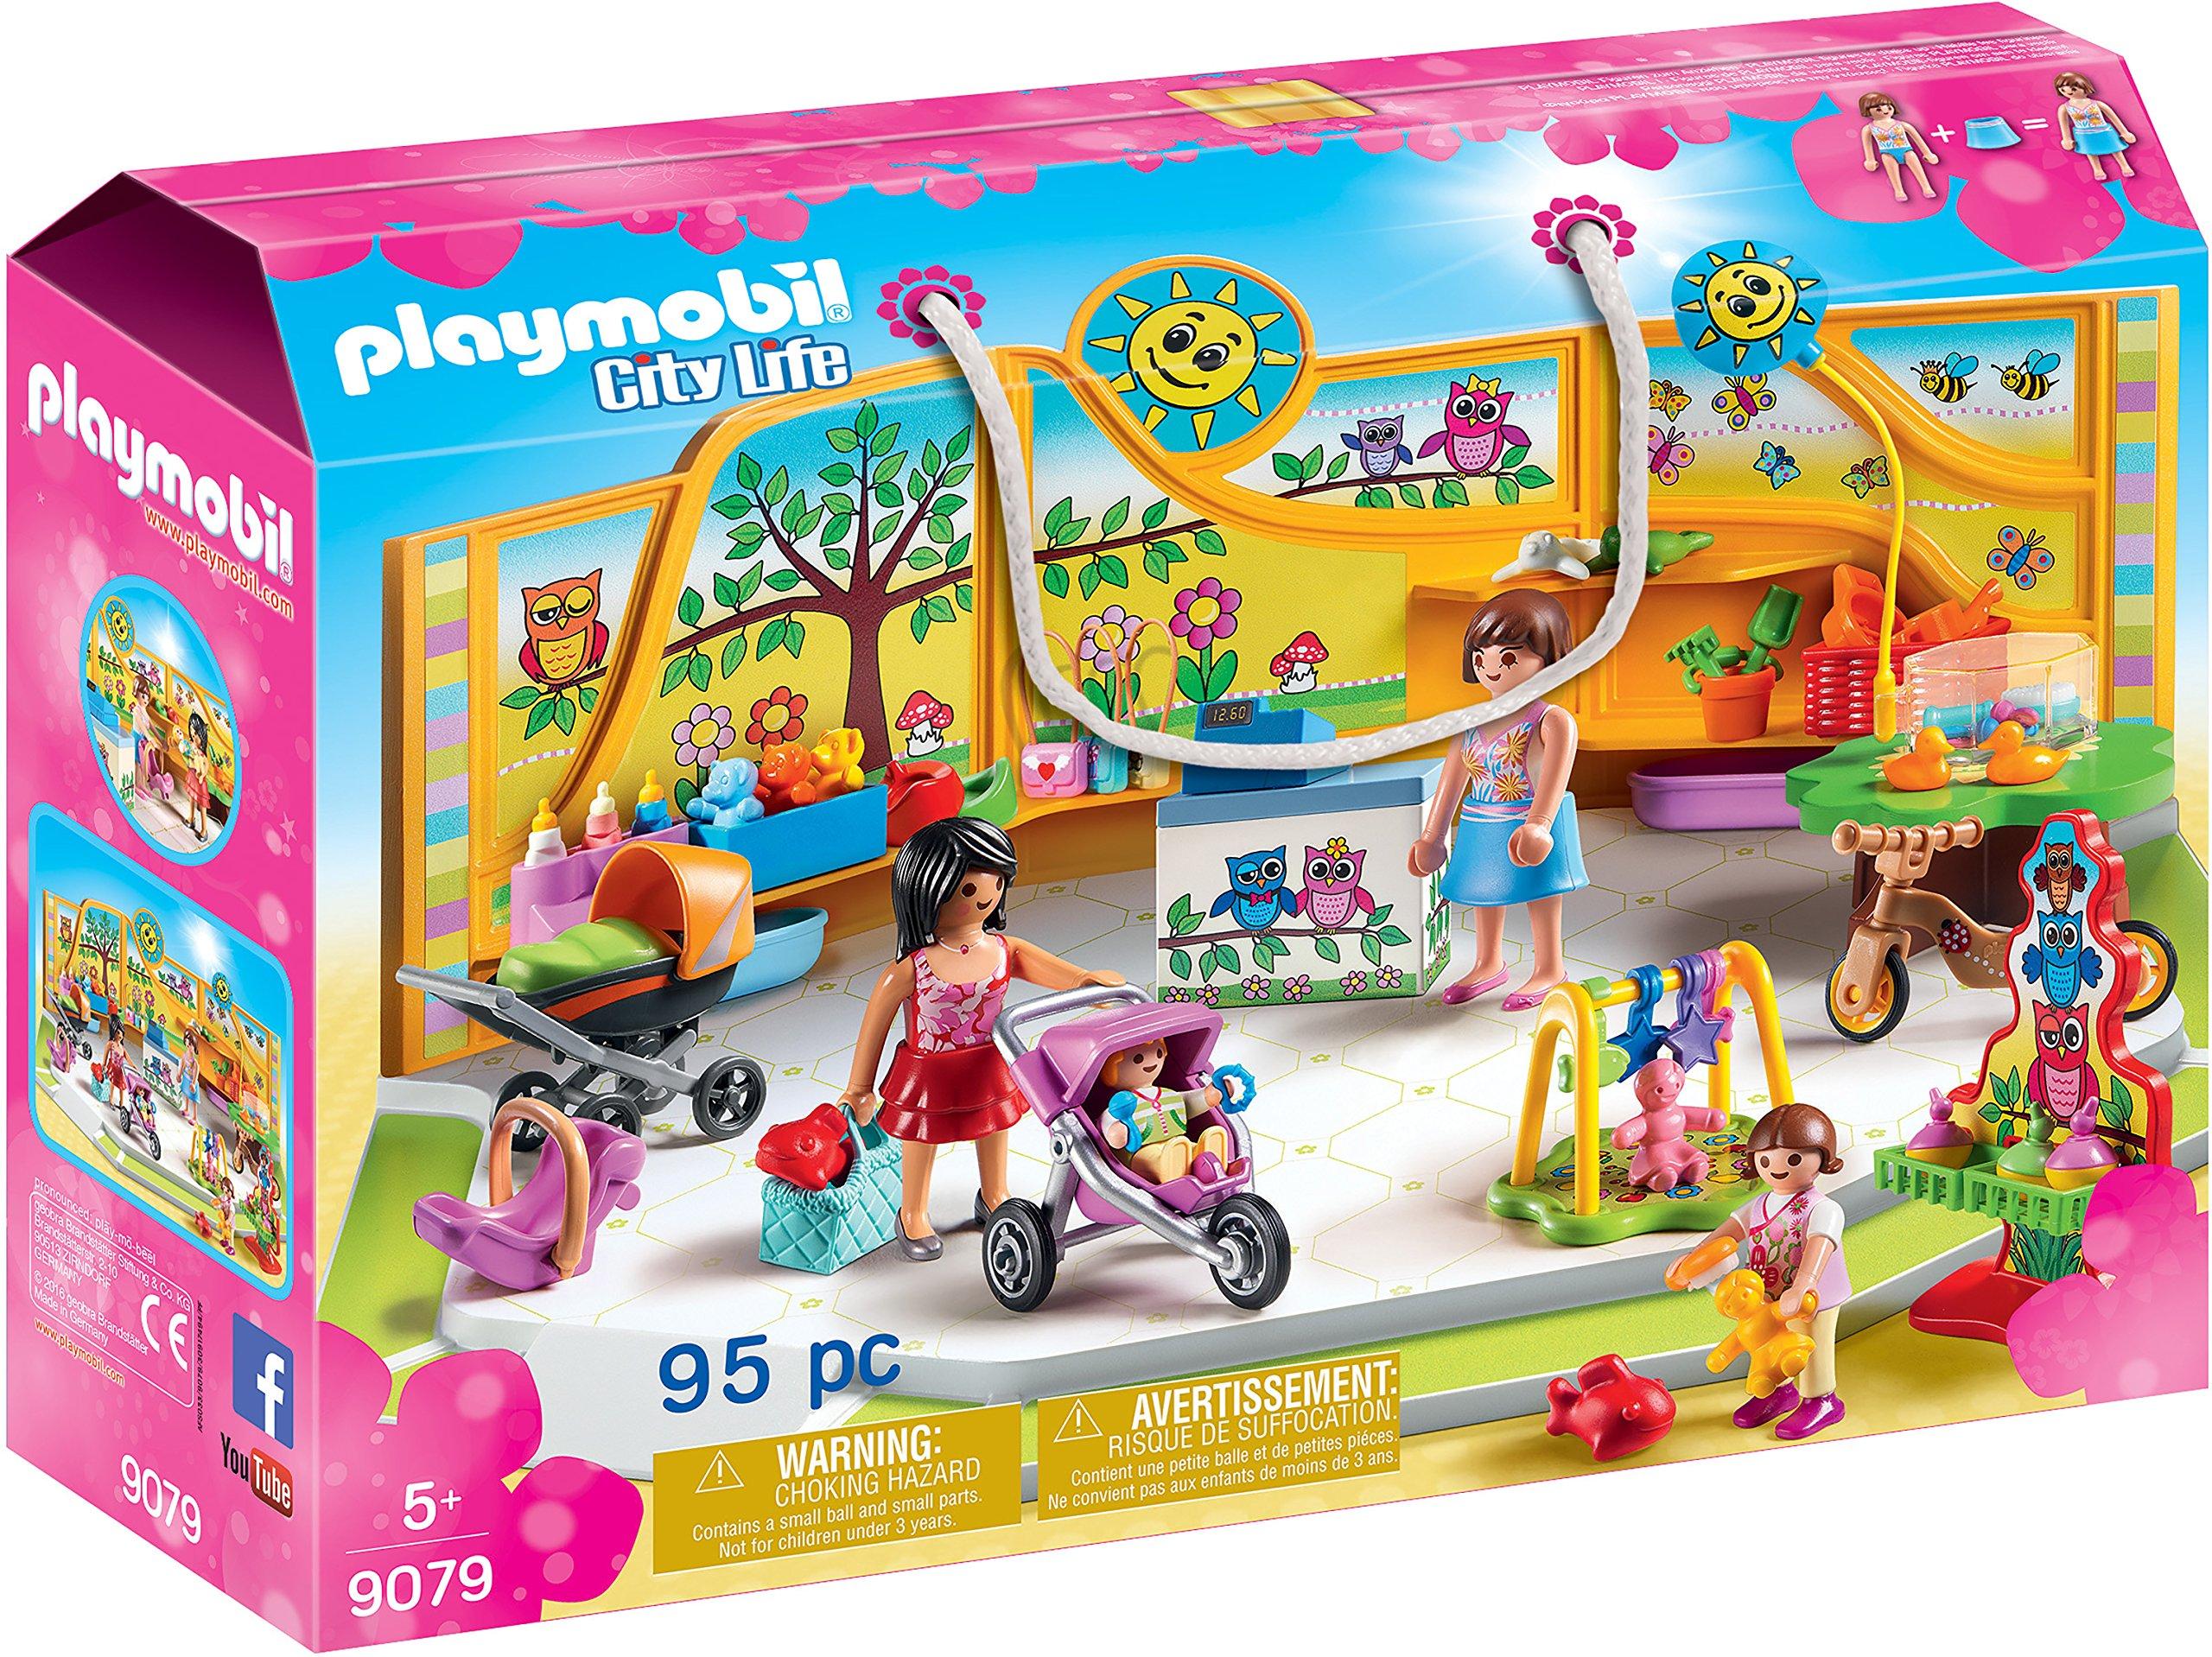 PLAYMOBIL City Life Tienda para Bebés, a Partir de 5 Años (9079 ...